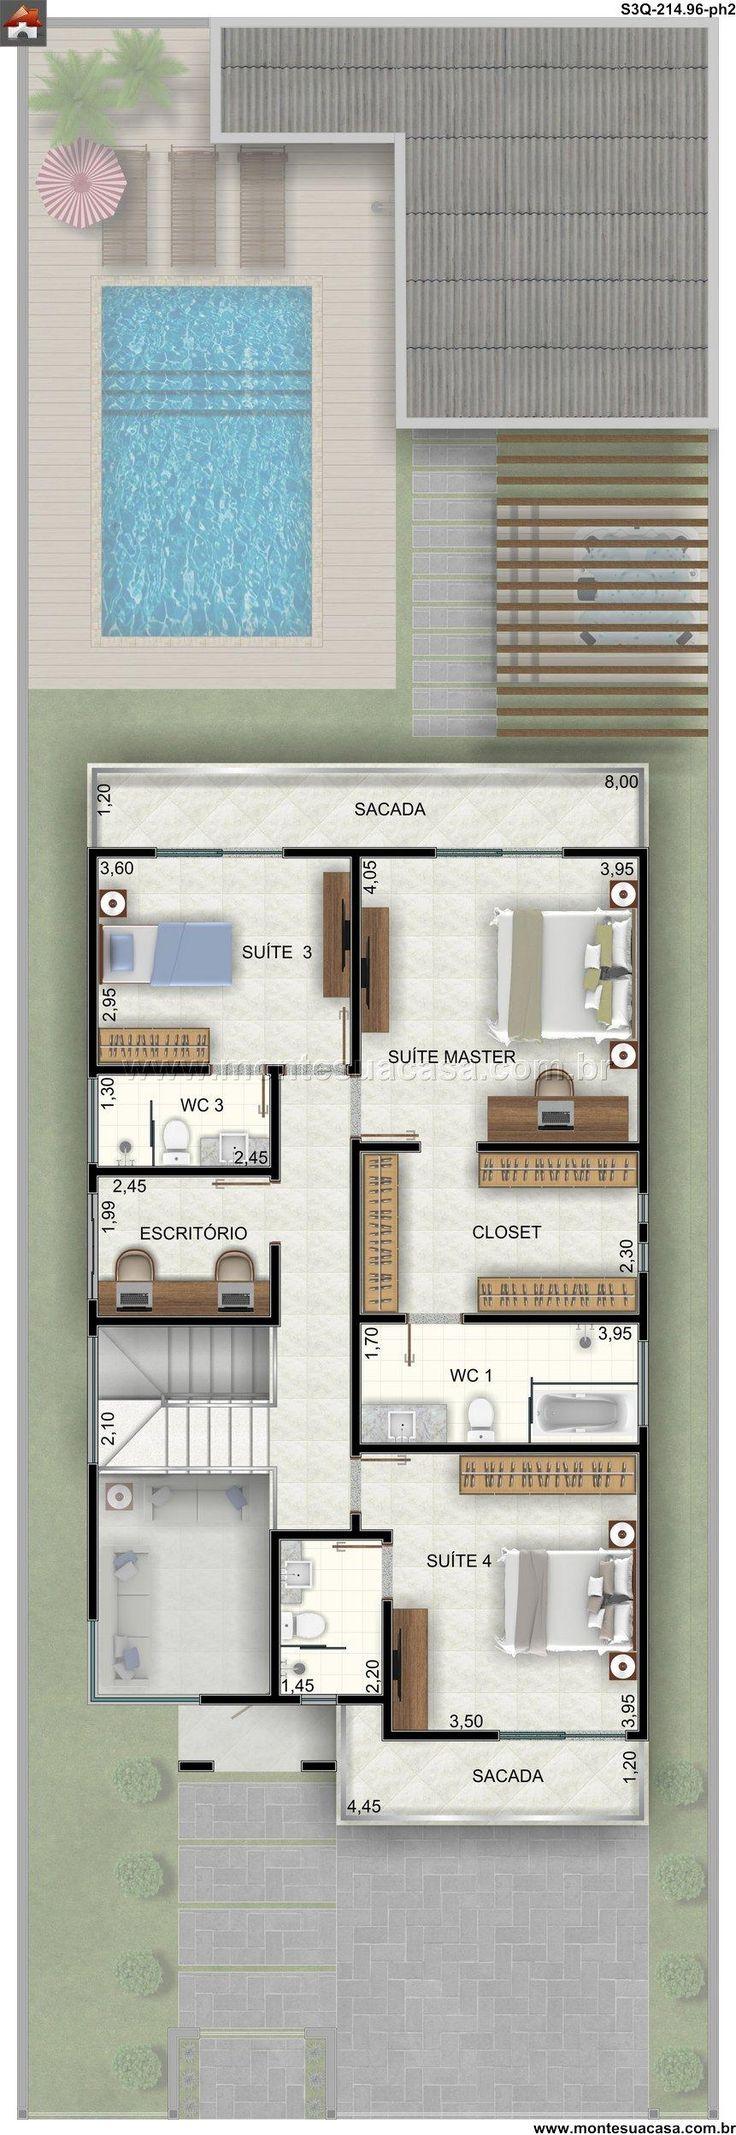 Pinterest: @claudiagabg | Casa 2 pisos 4 cuartos 1 estudio piscina / planta 2